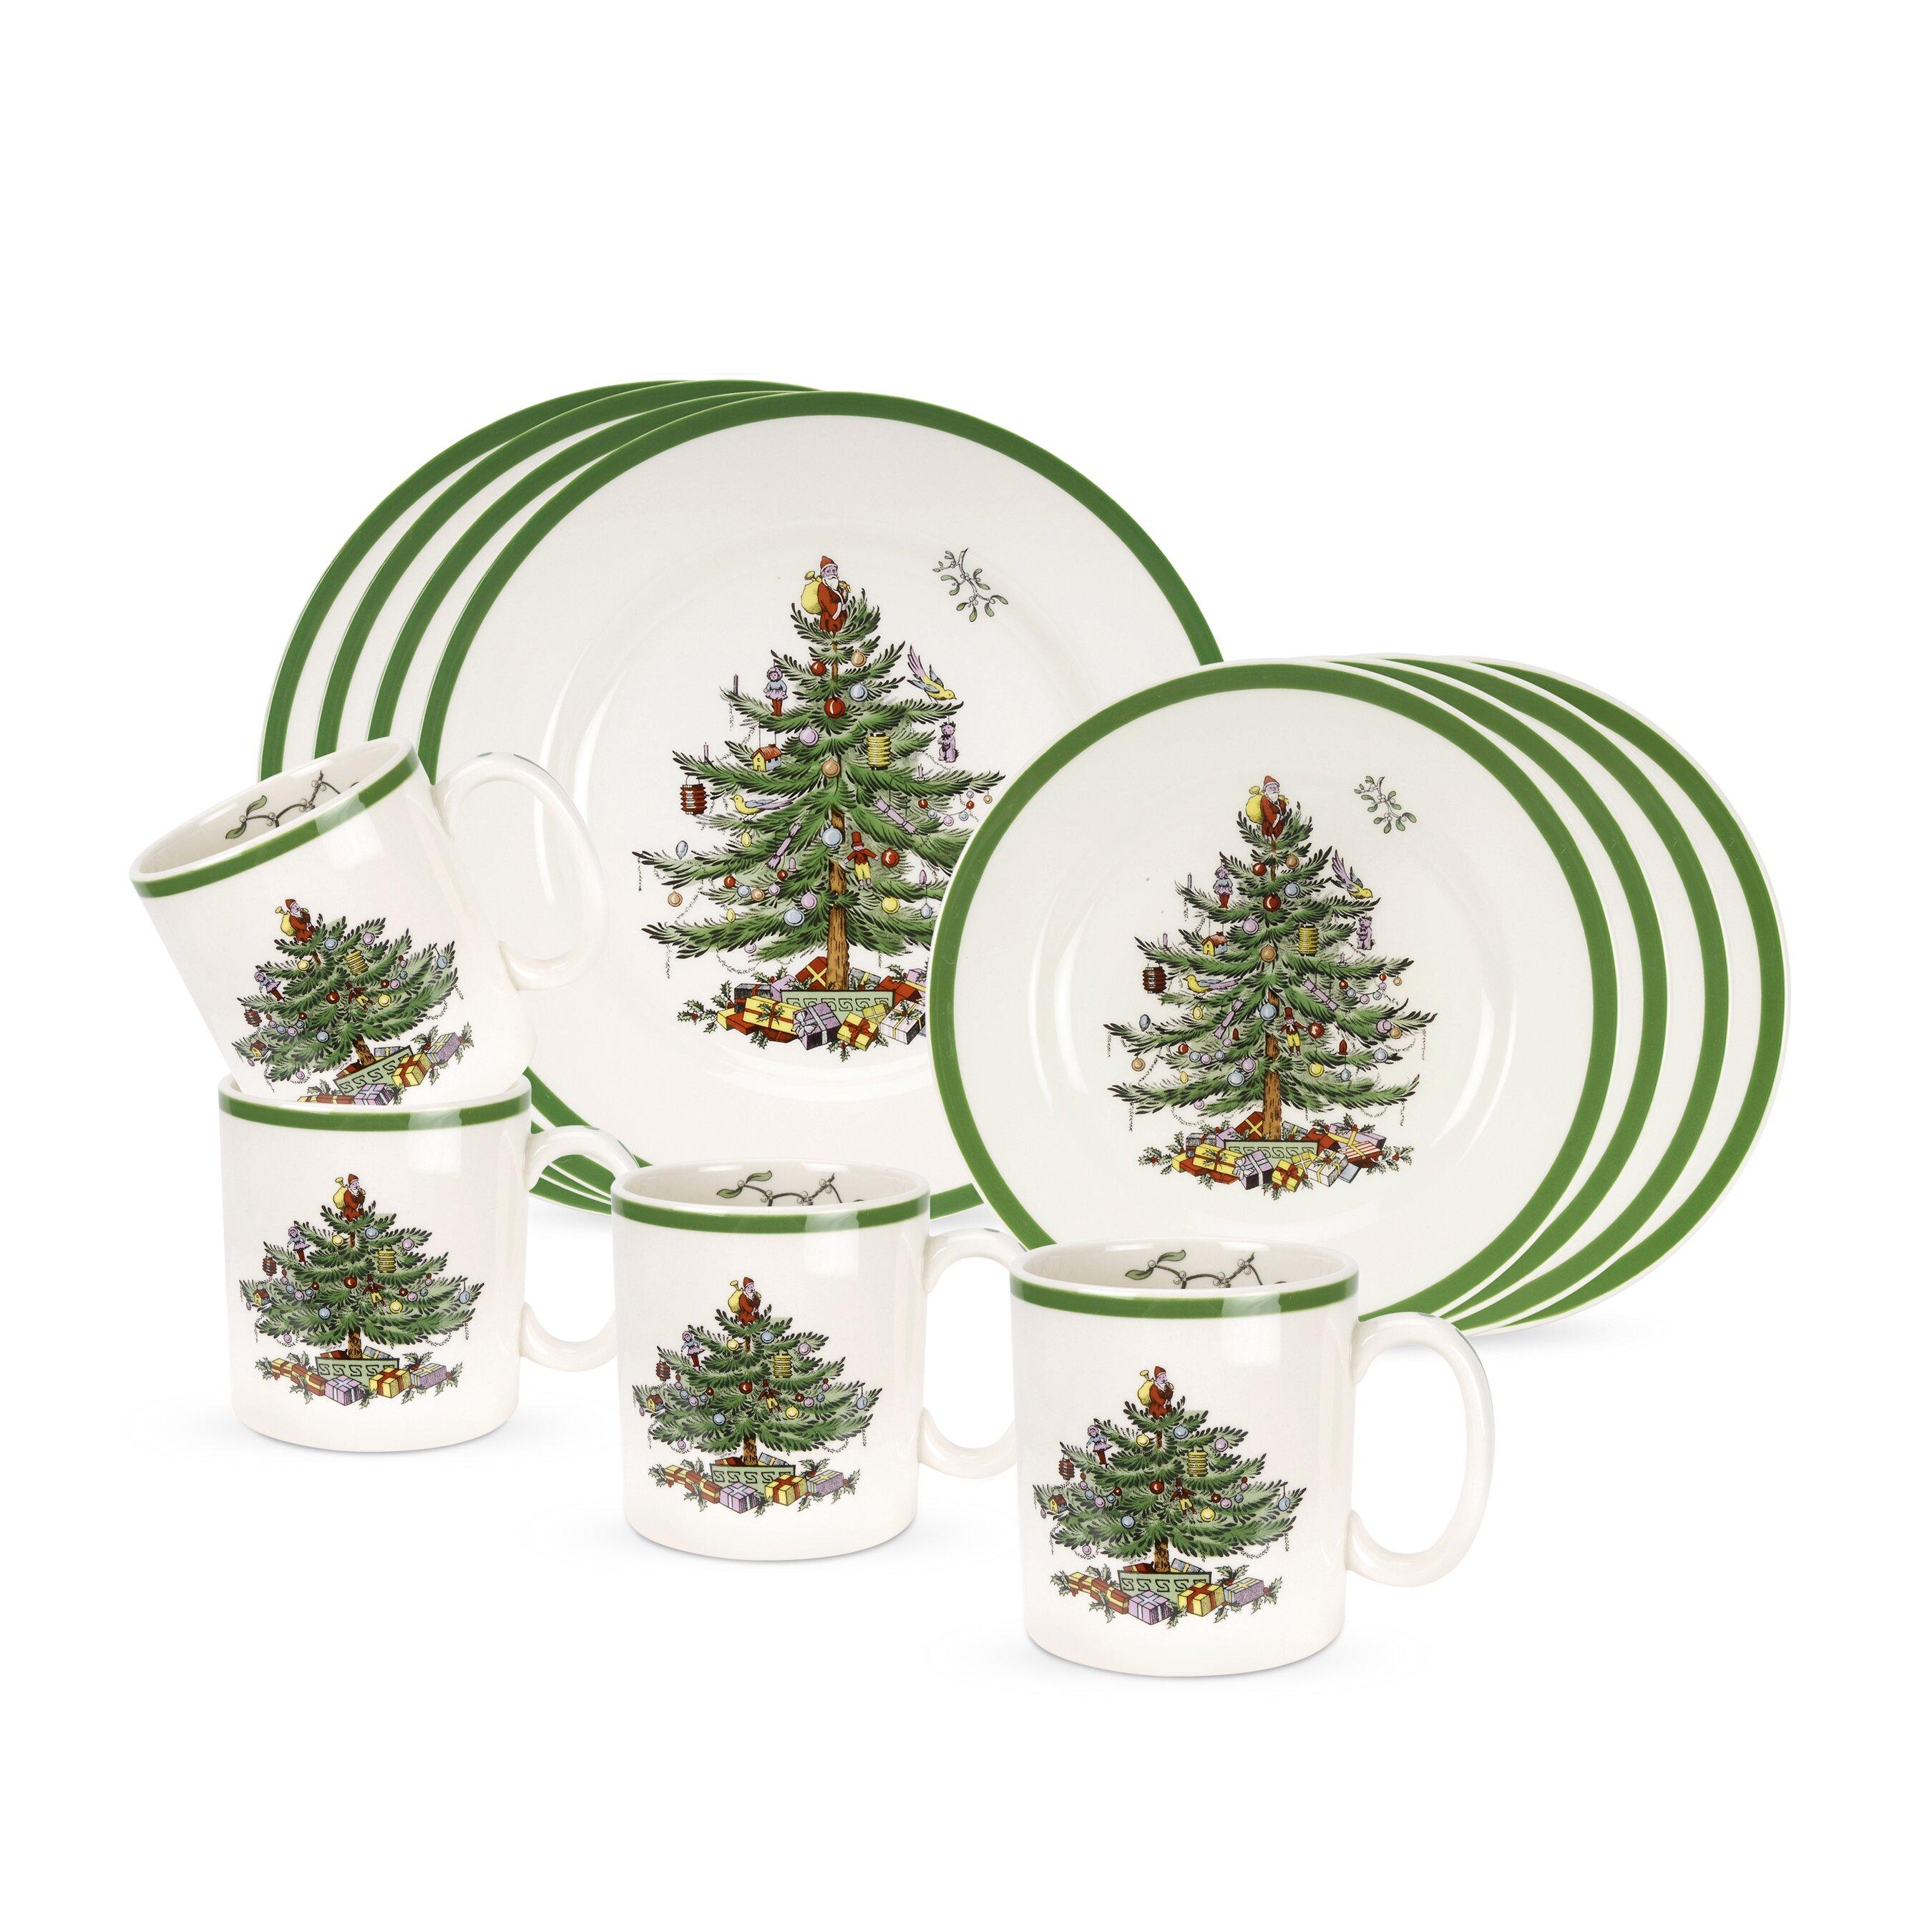 12 Days Of Christmas Dinnerware